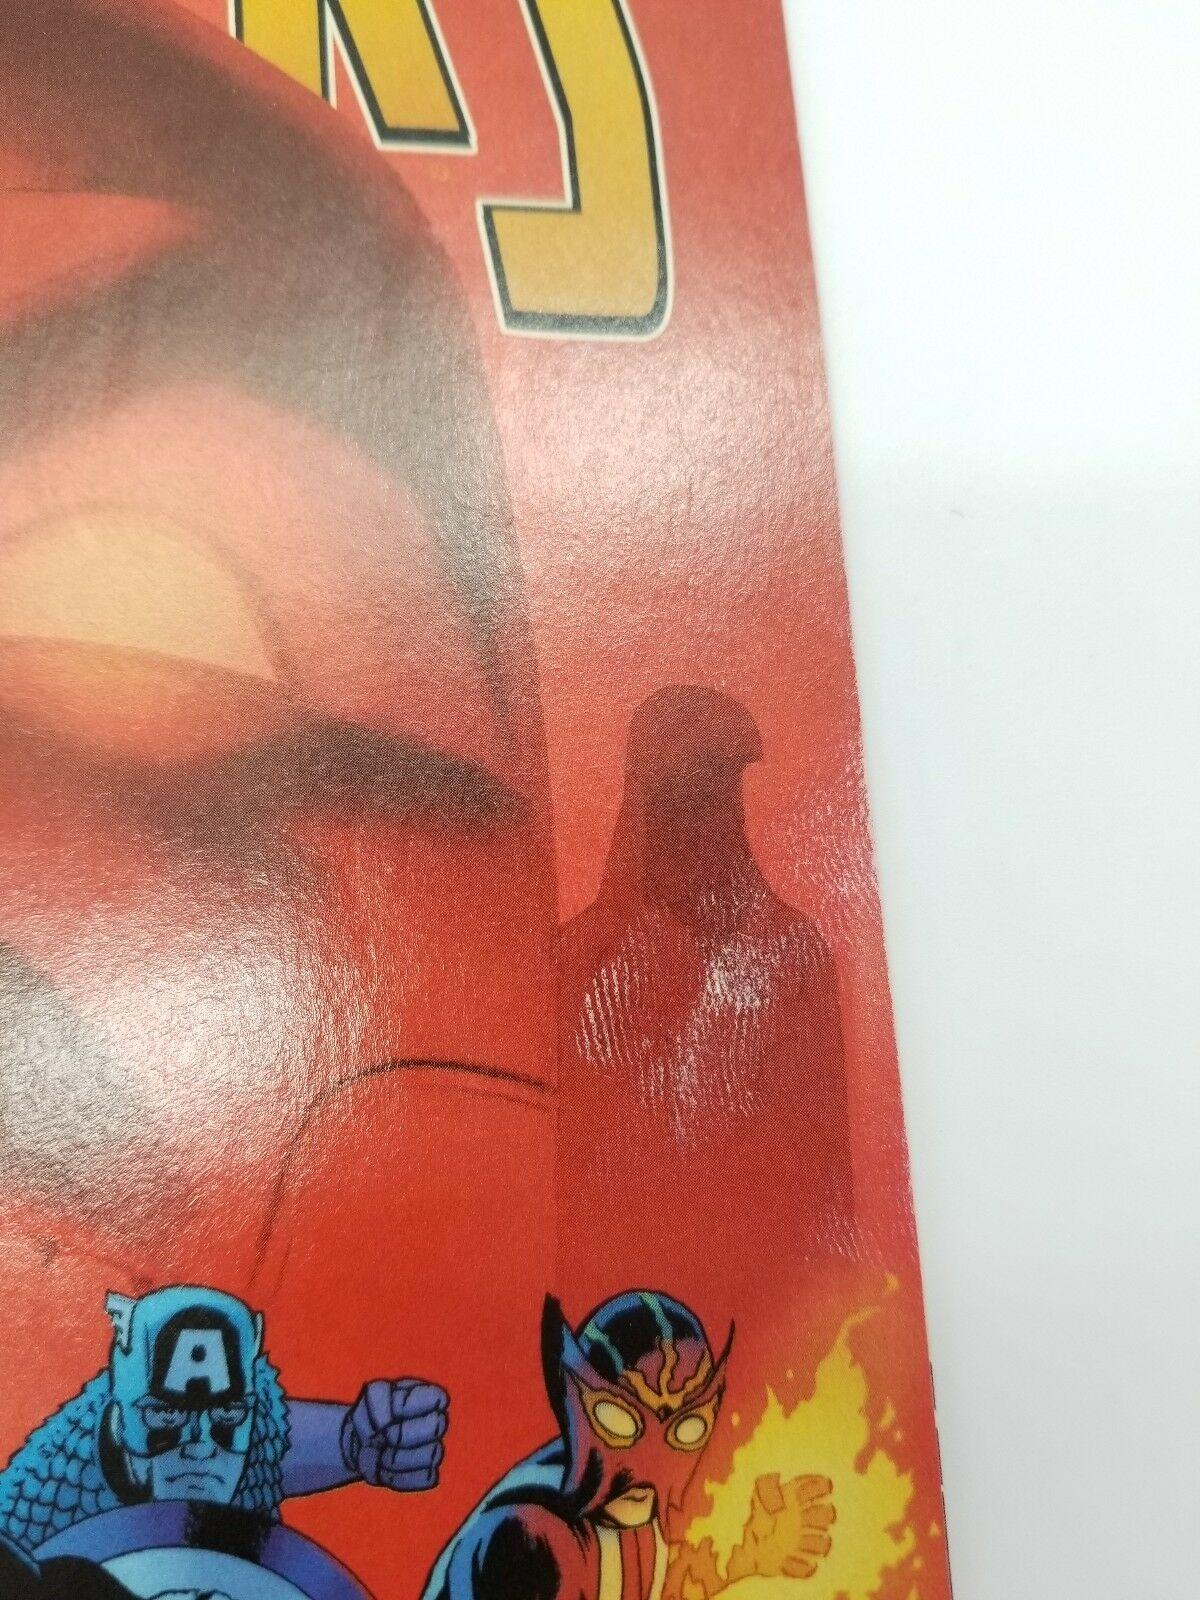 Uncanny Avengers 1-11 14-16 w/ Skottie Young Baby Variant Vol 1 2012 Comic Books image 5